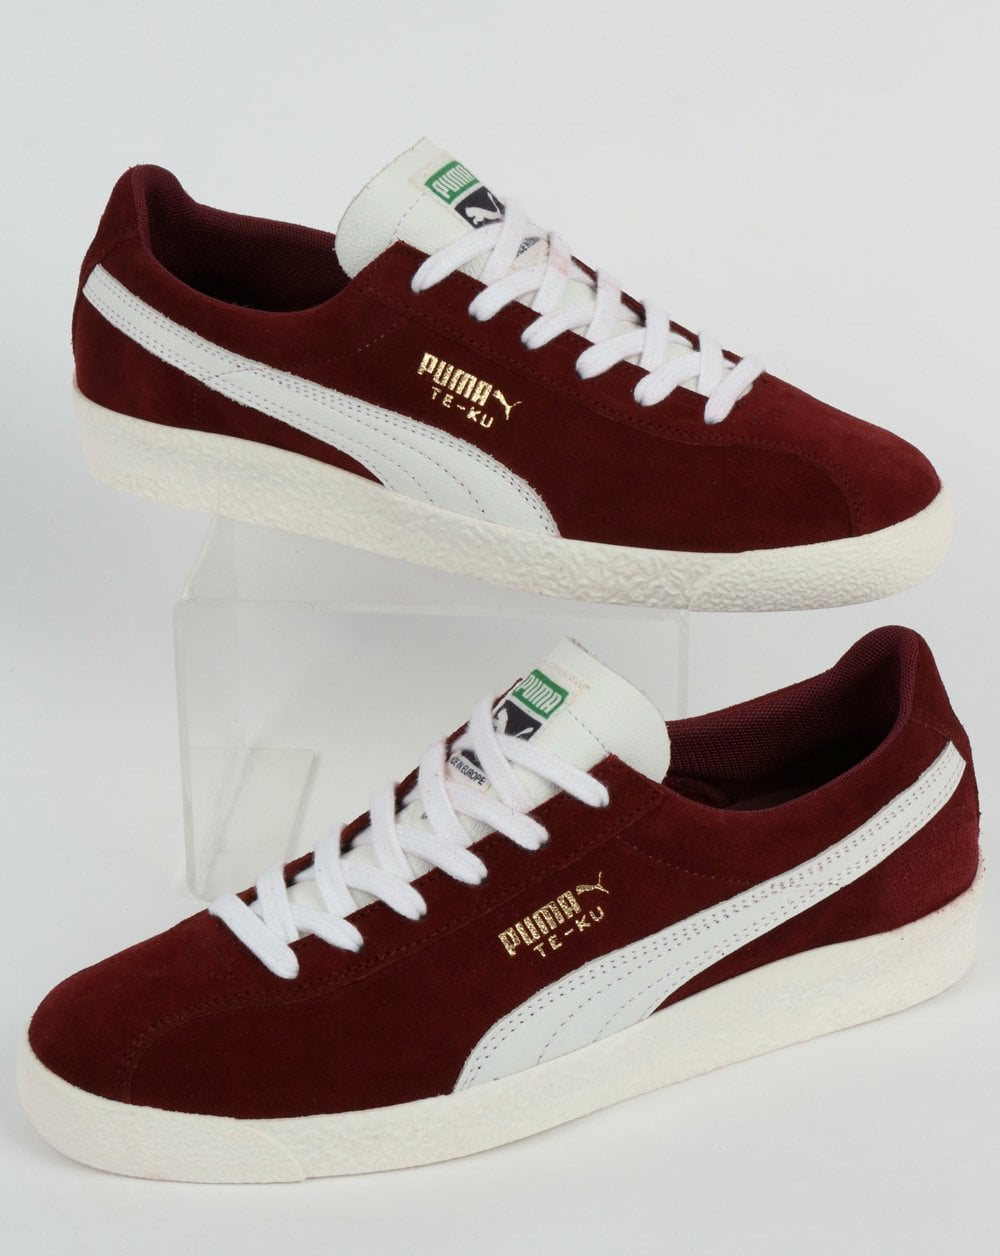 new styles 880f9 3a9c9 Puma Te-ku Prime Trainer Pomegranate/White